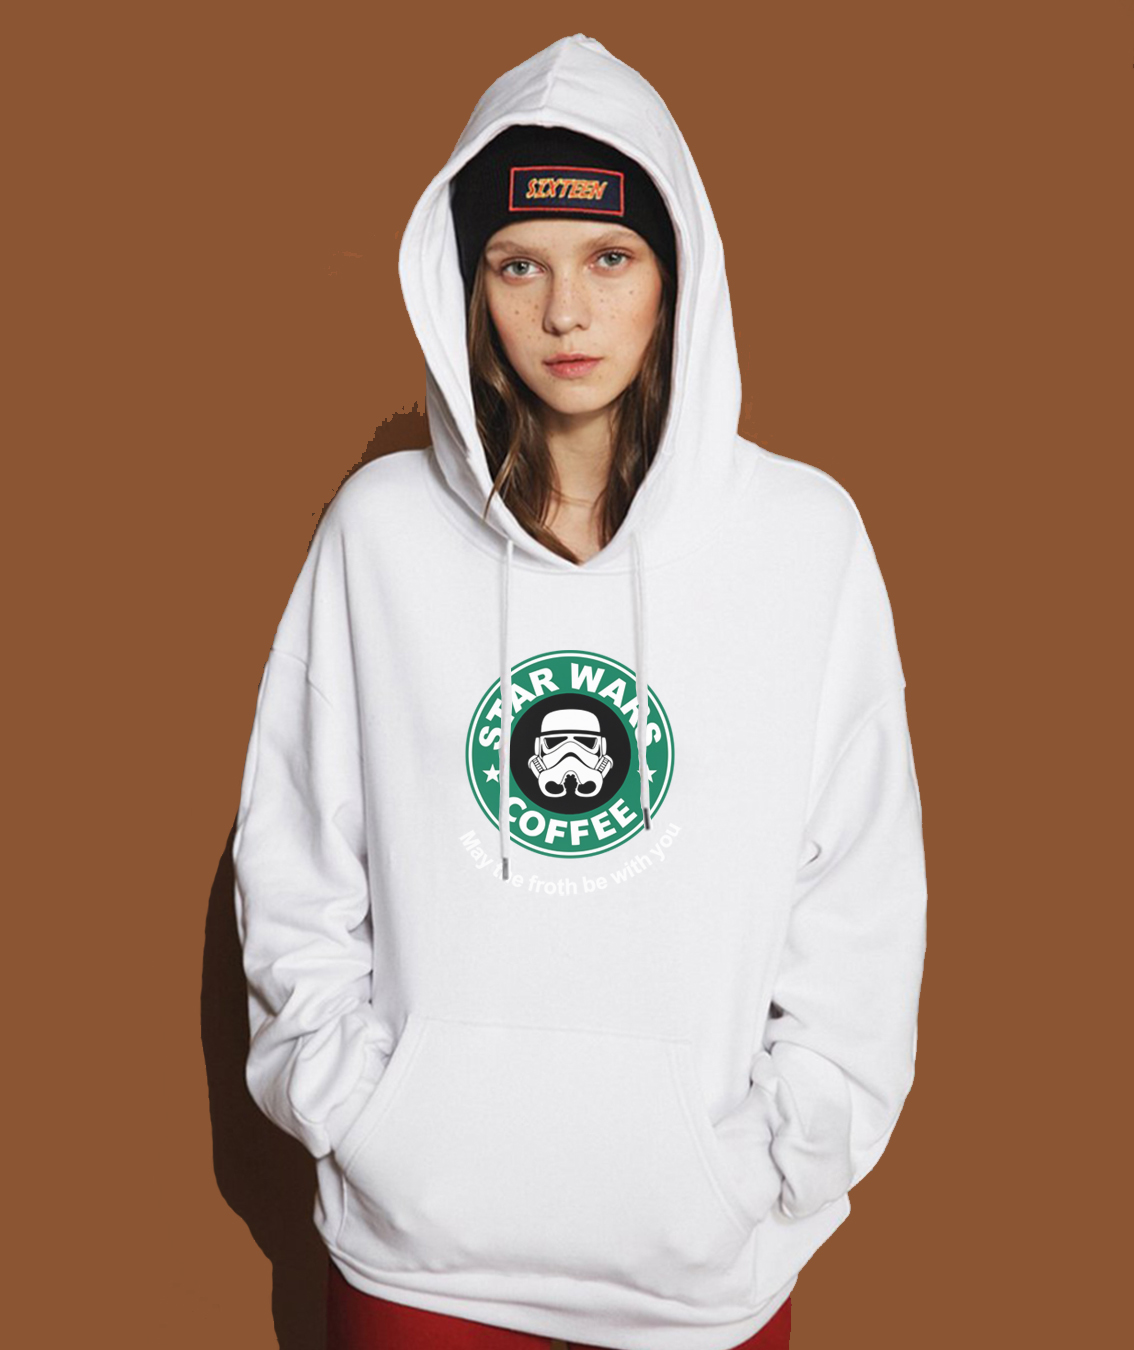 2019 Spring Winter Hoodies Womens Brand Clothing Print Letters Brand Women's Sportswear Sweatshirt Pullover Female Hipster K-pop